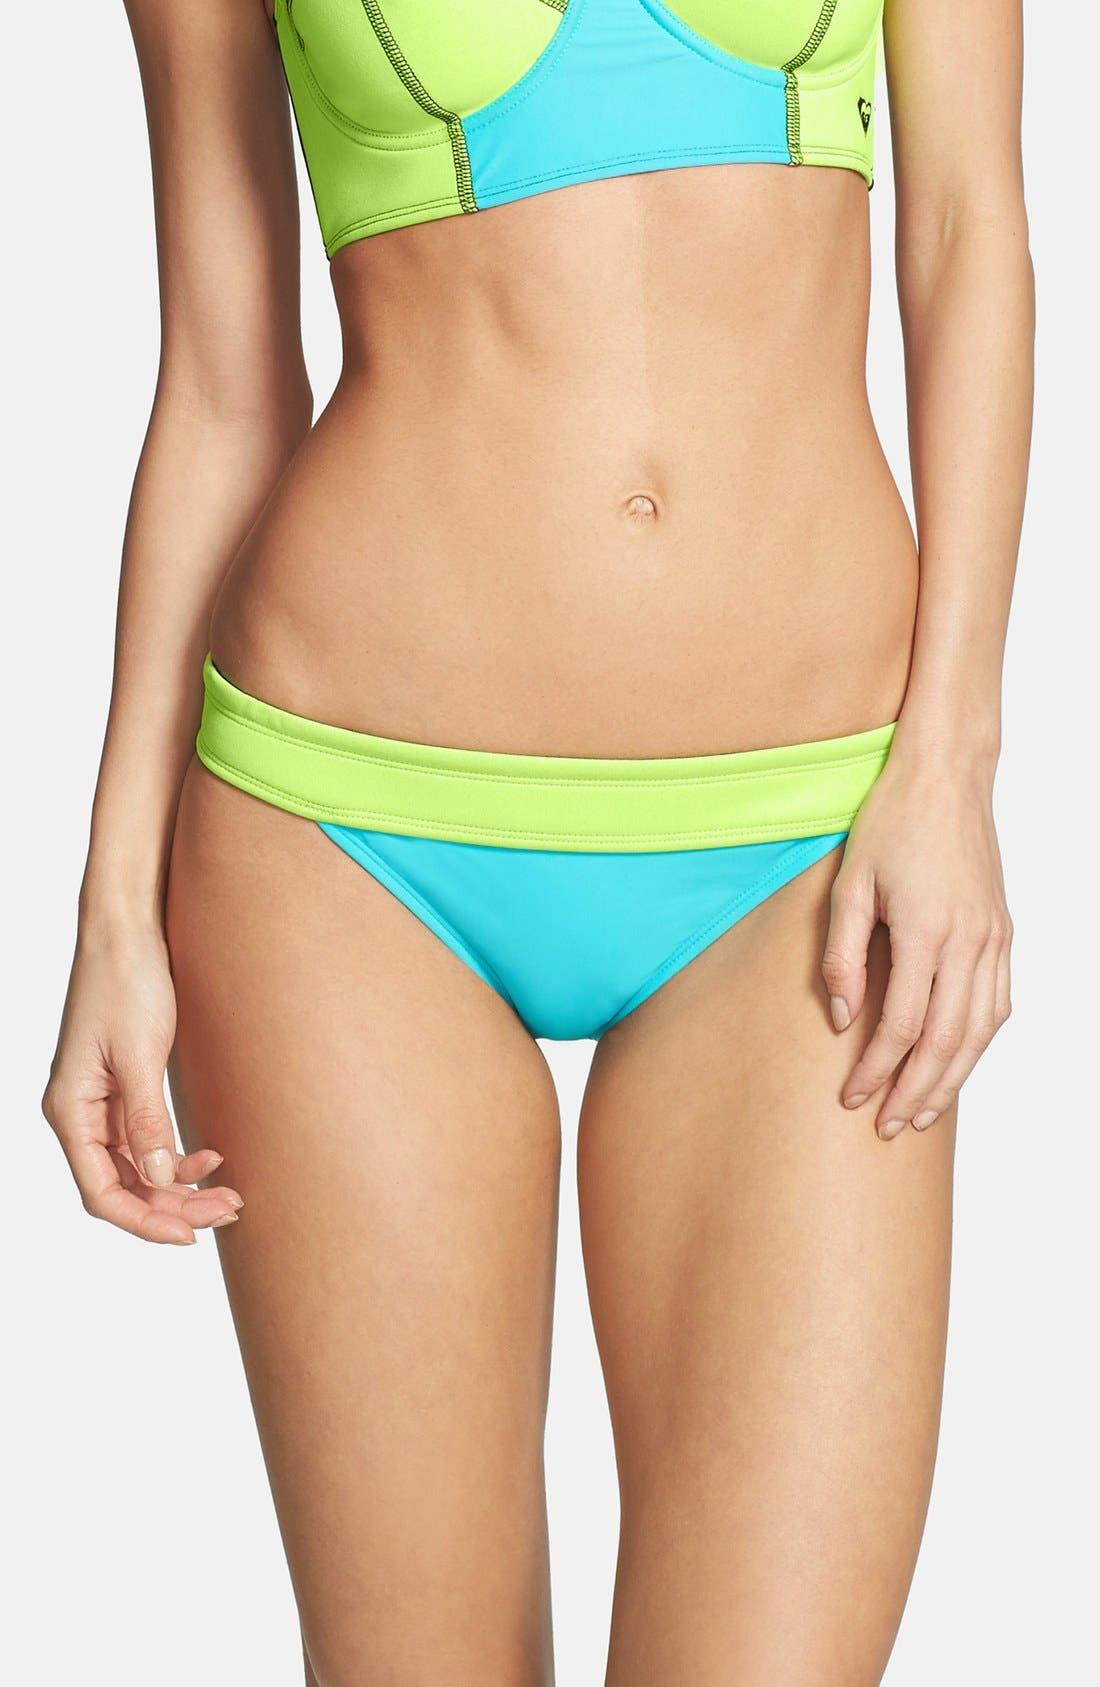 Alternate Image 1 Selected - Roxy 'Neon Tide' Low-Rise Bikini Bottoms